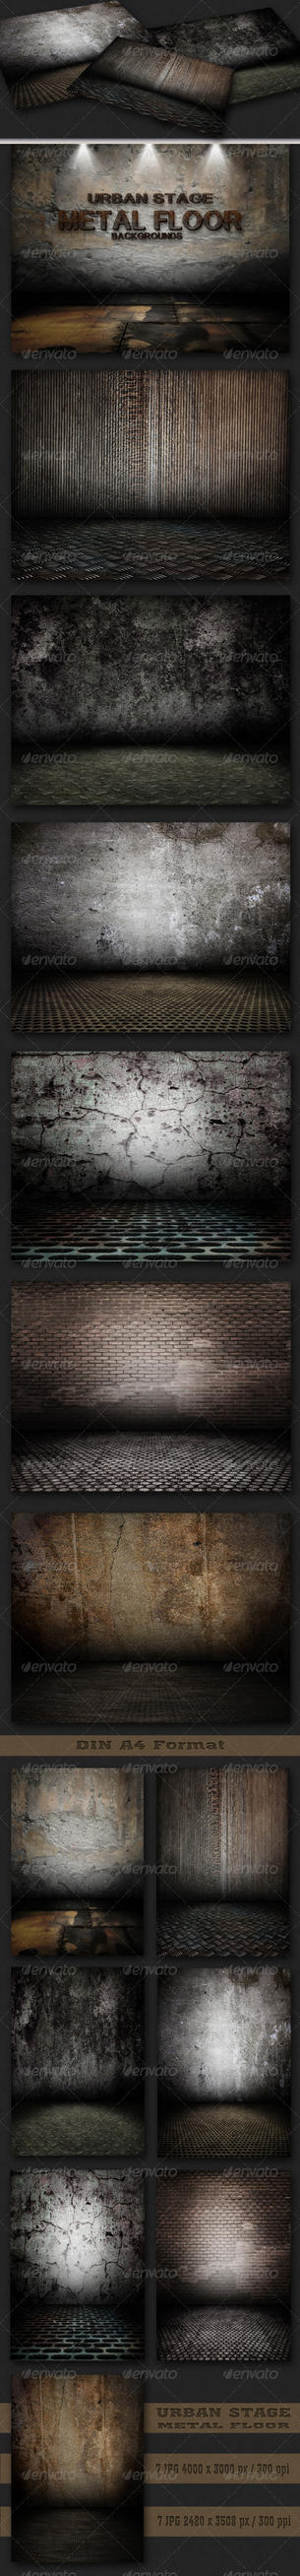 Urban Stage - Metal Floor Set by AzureRayArt